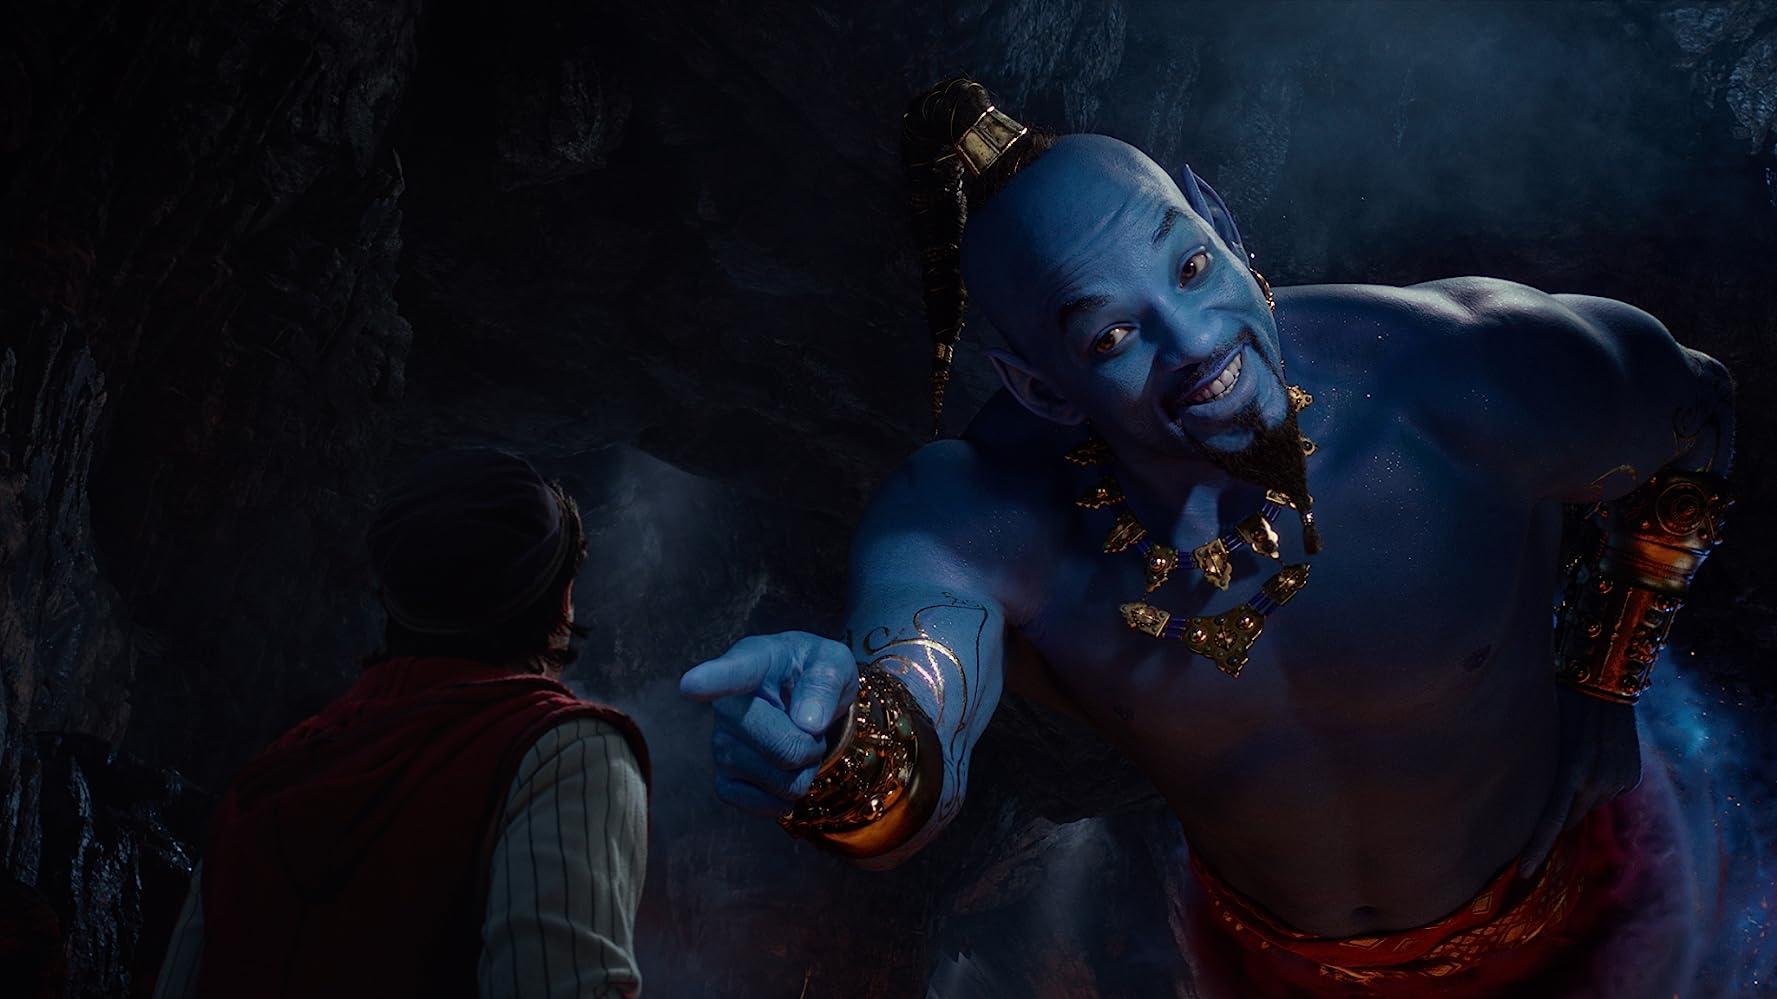 Will Smith et Mena Massoud dans Aladdin (2019)